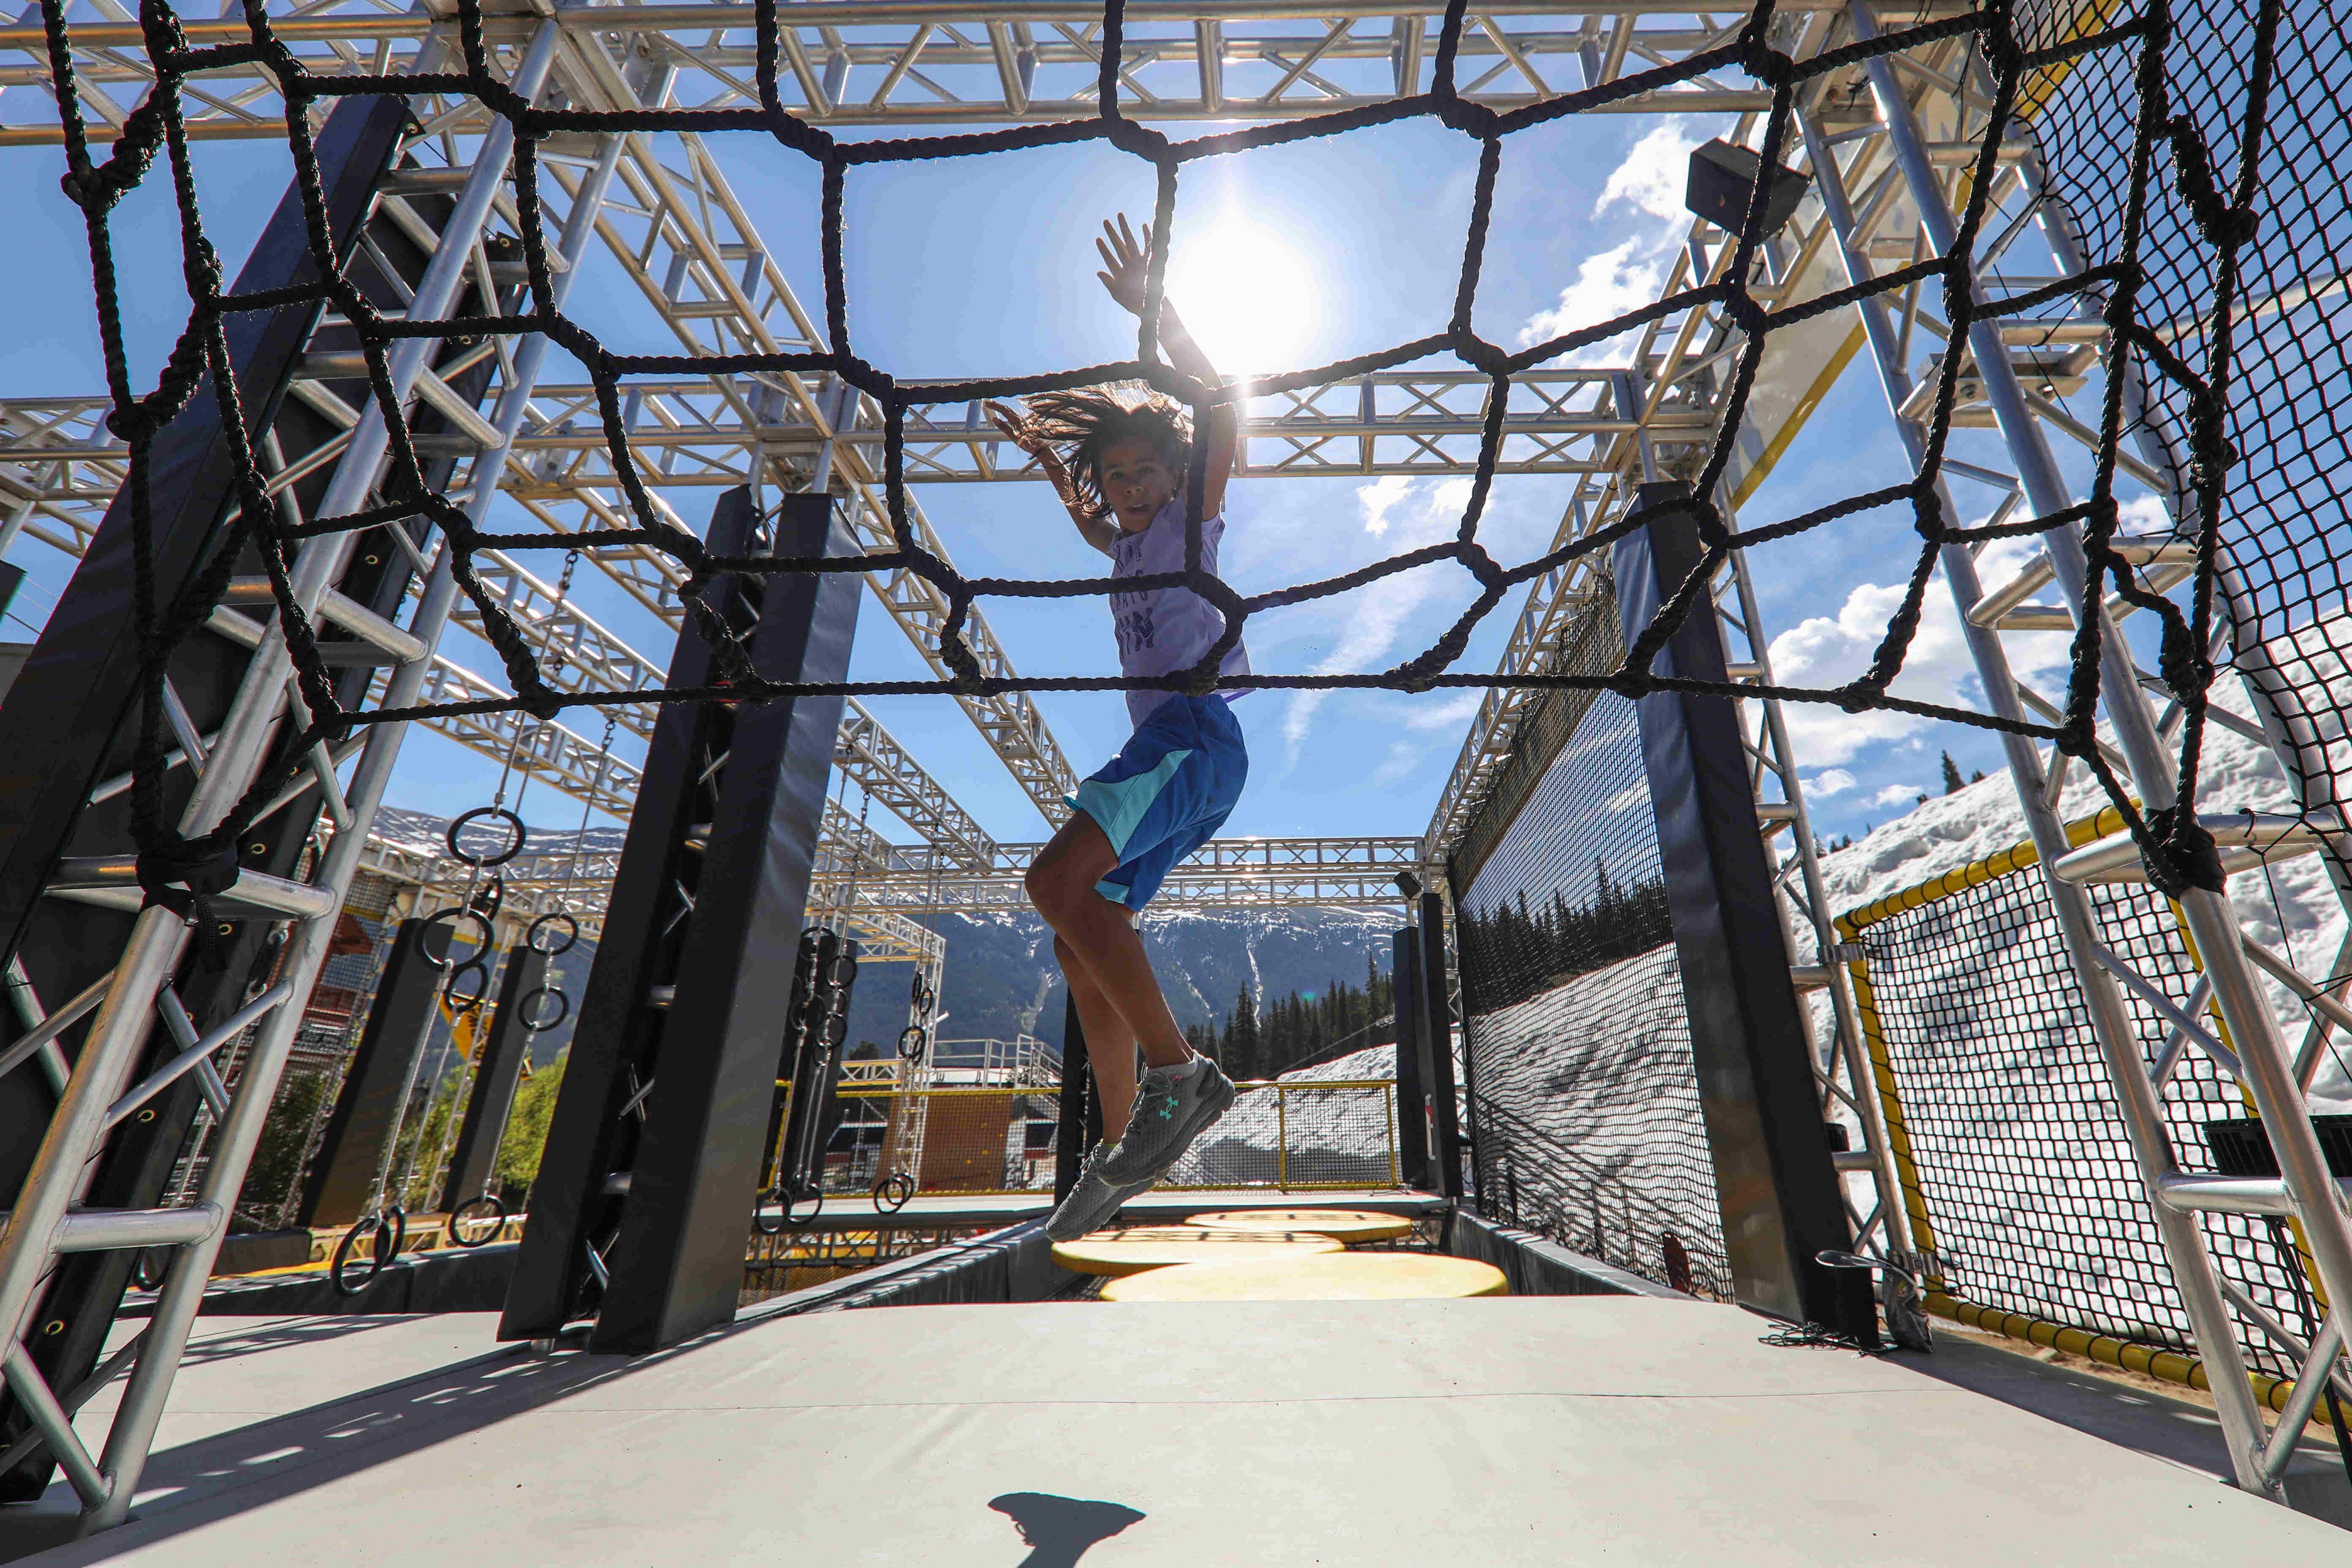 Colorado's Copper Mountain resort unveils no-snow obstacle attraction